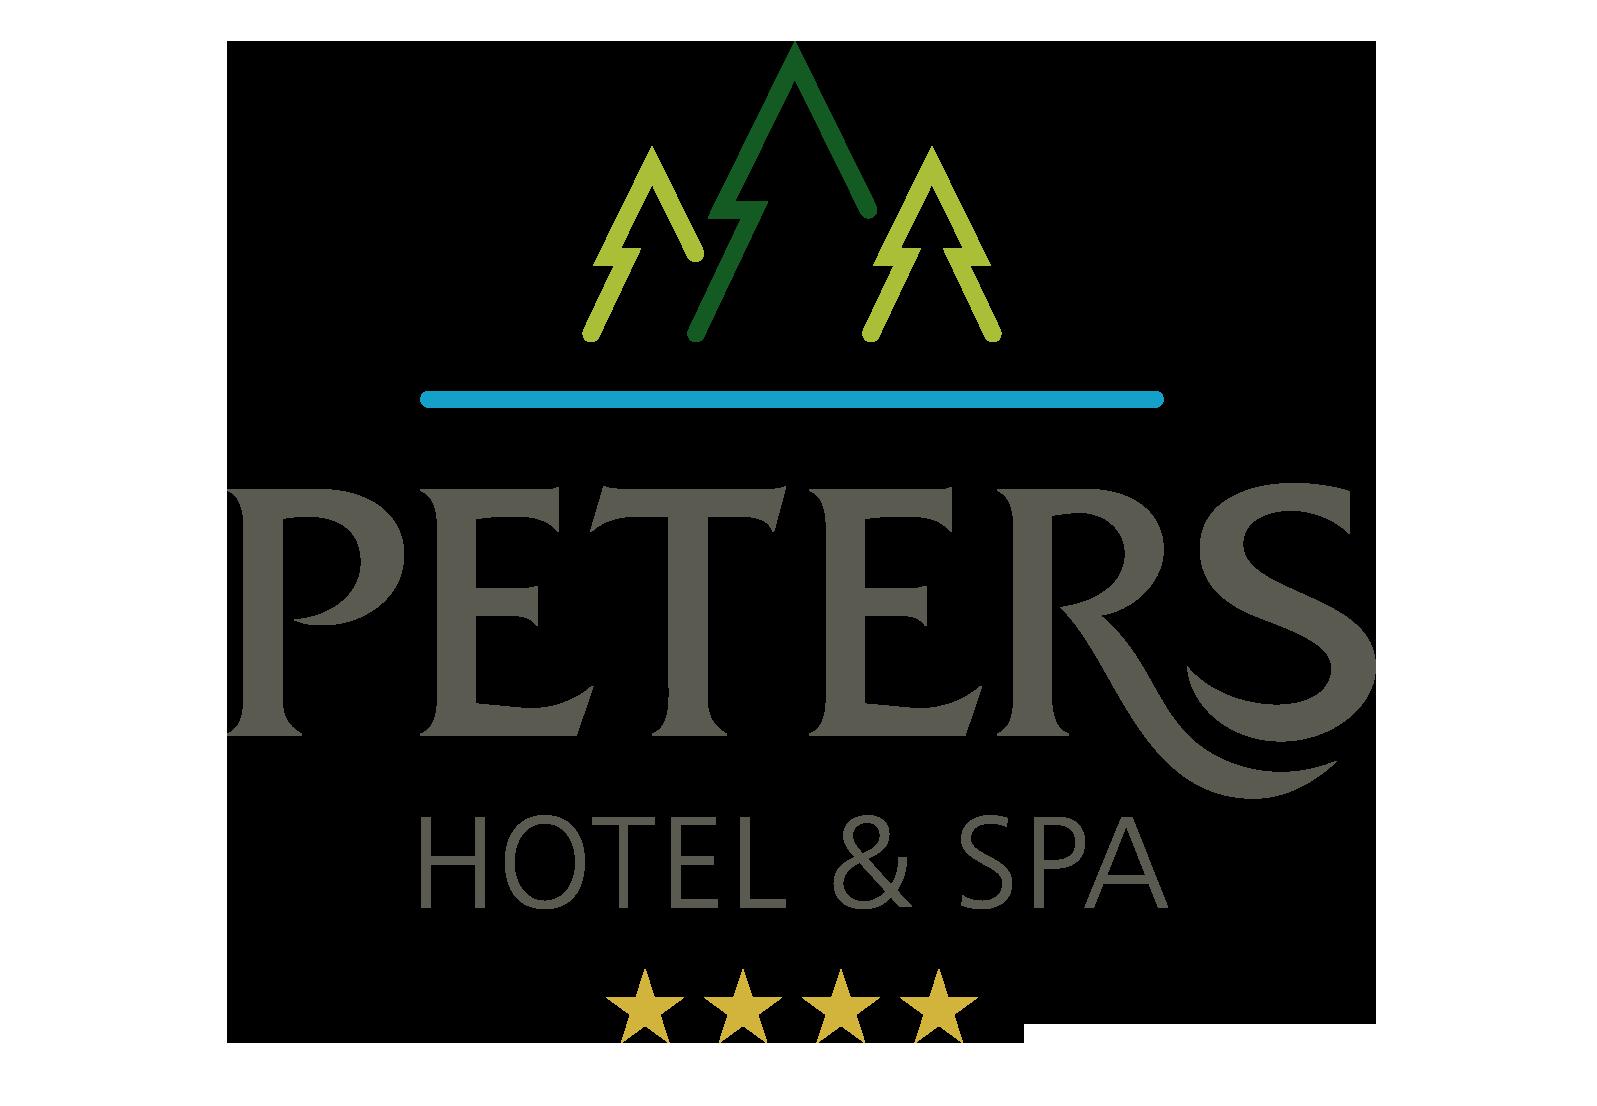 PETERS Hotel & Spa Logo